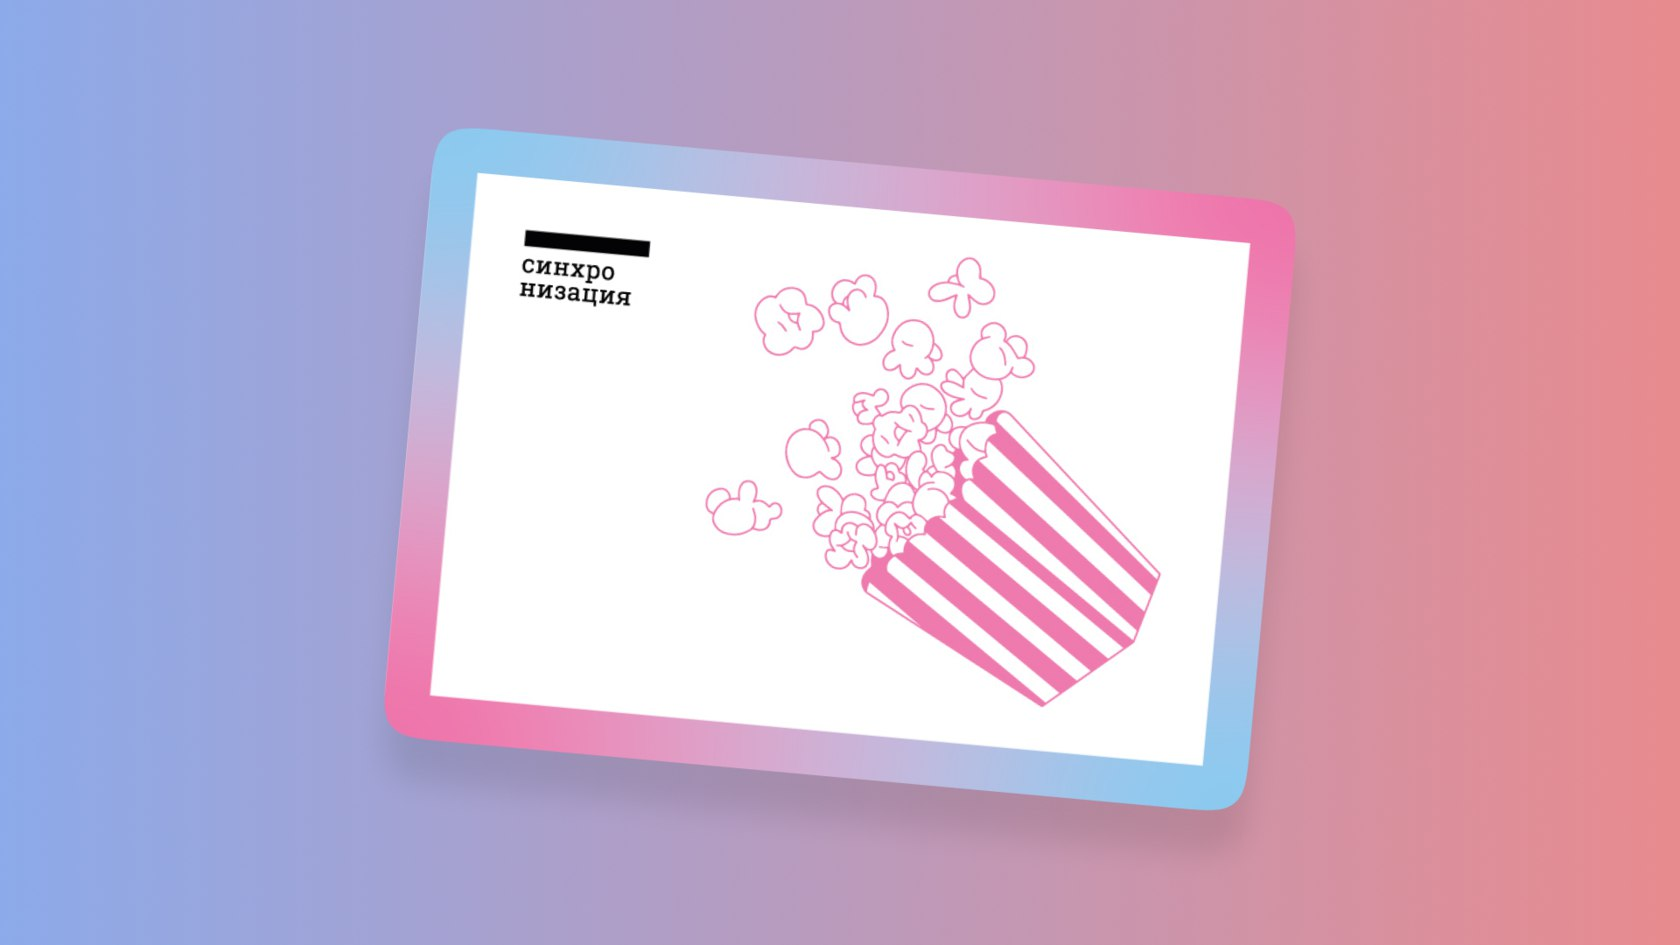 Начнём неделю с подарков   Платформа онлайн-курсов «Синхронизация» дарит...